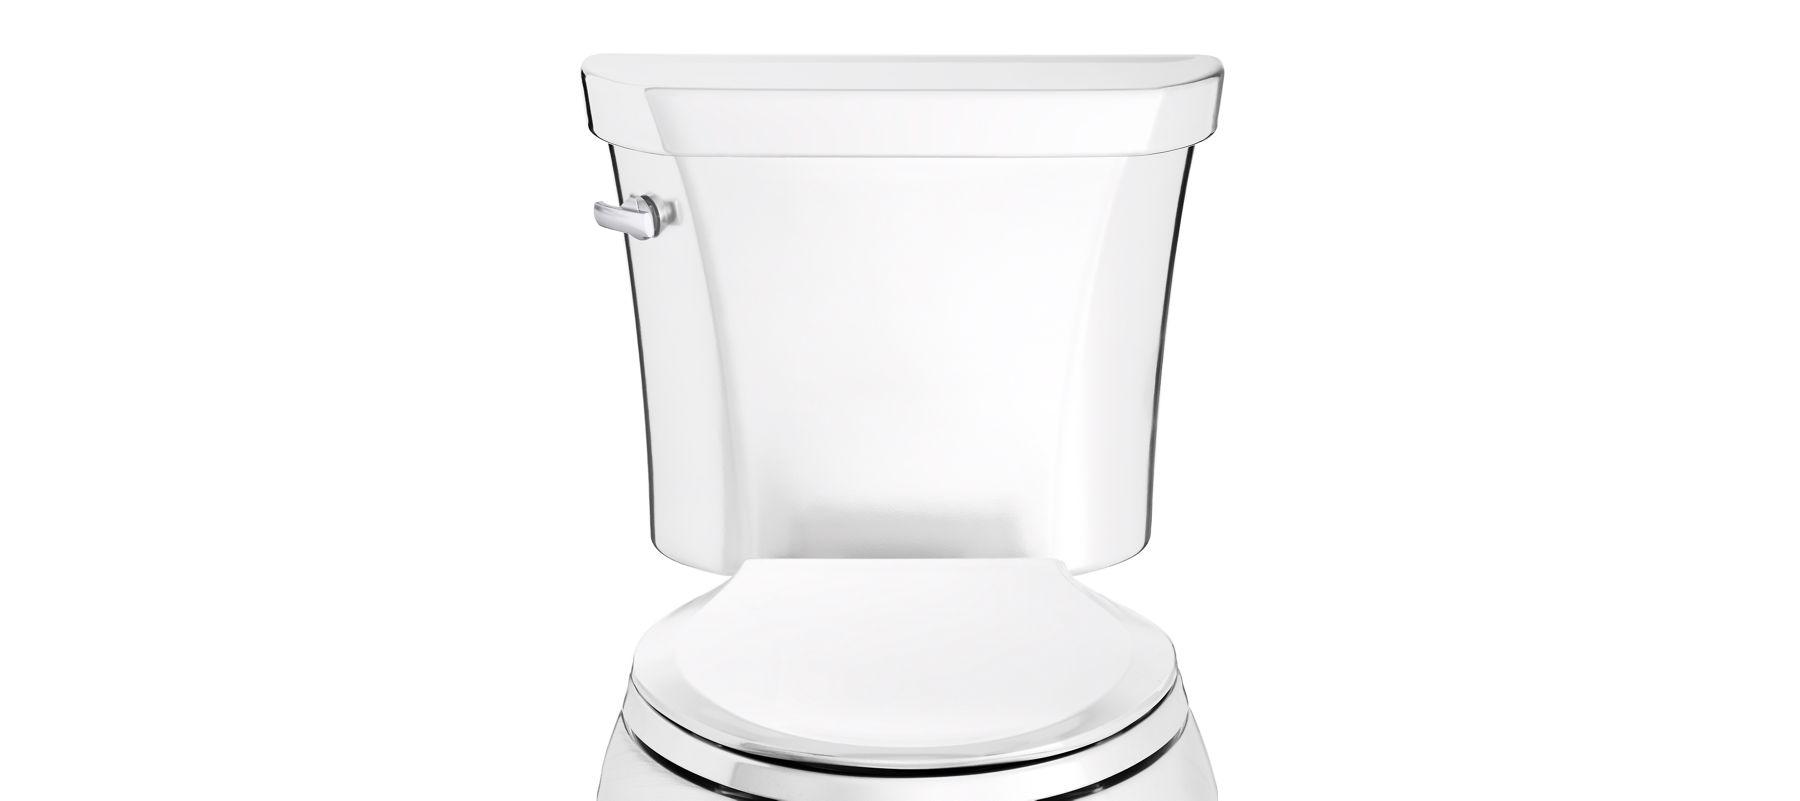 Toilets Bathroom Kohler